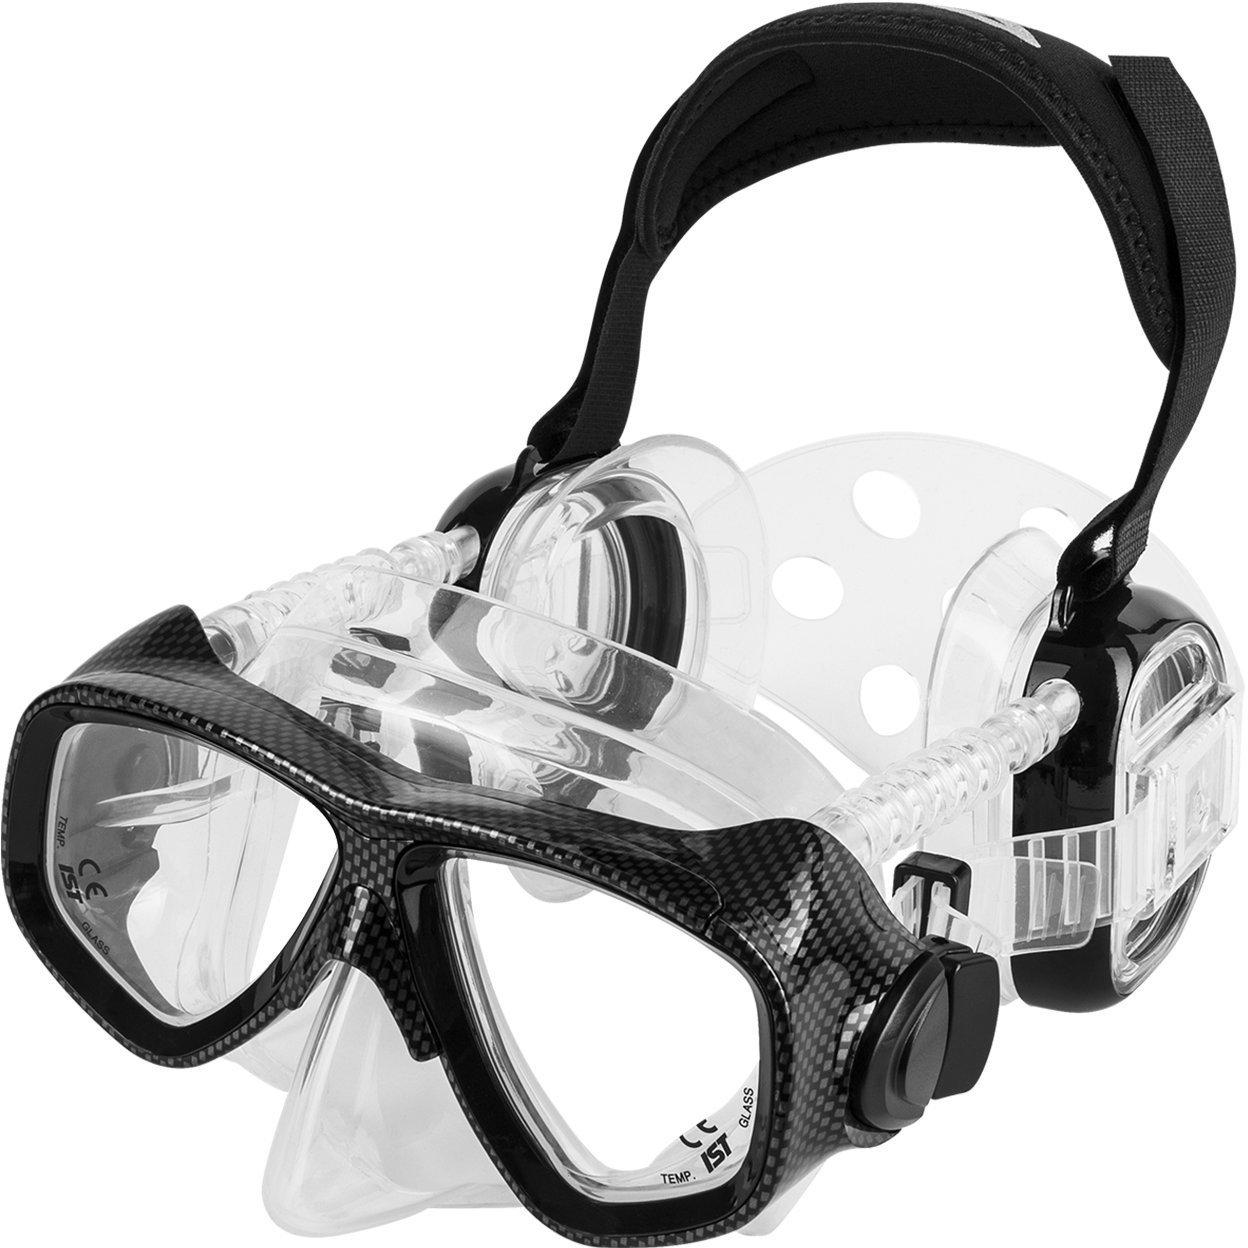 IST ME80 Pro Ear Mask (Black) by IST